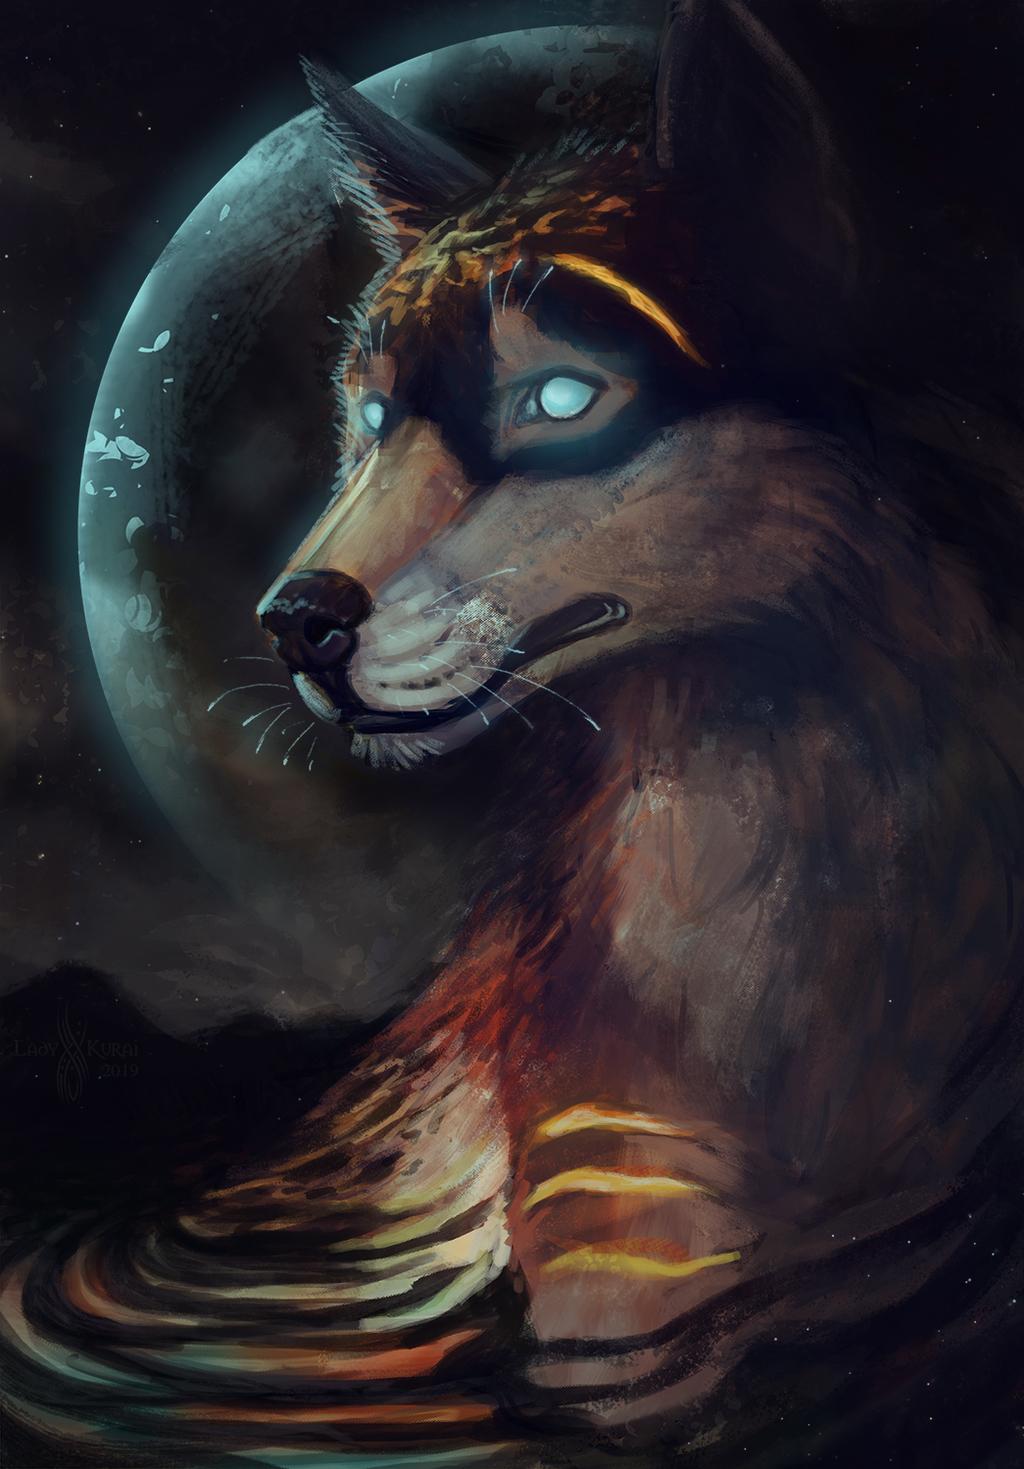 Dark Side of the Moon by Lady Kurai